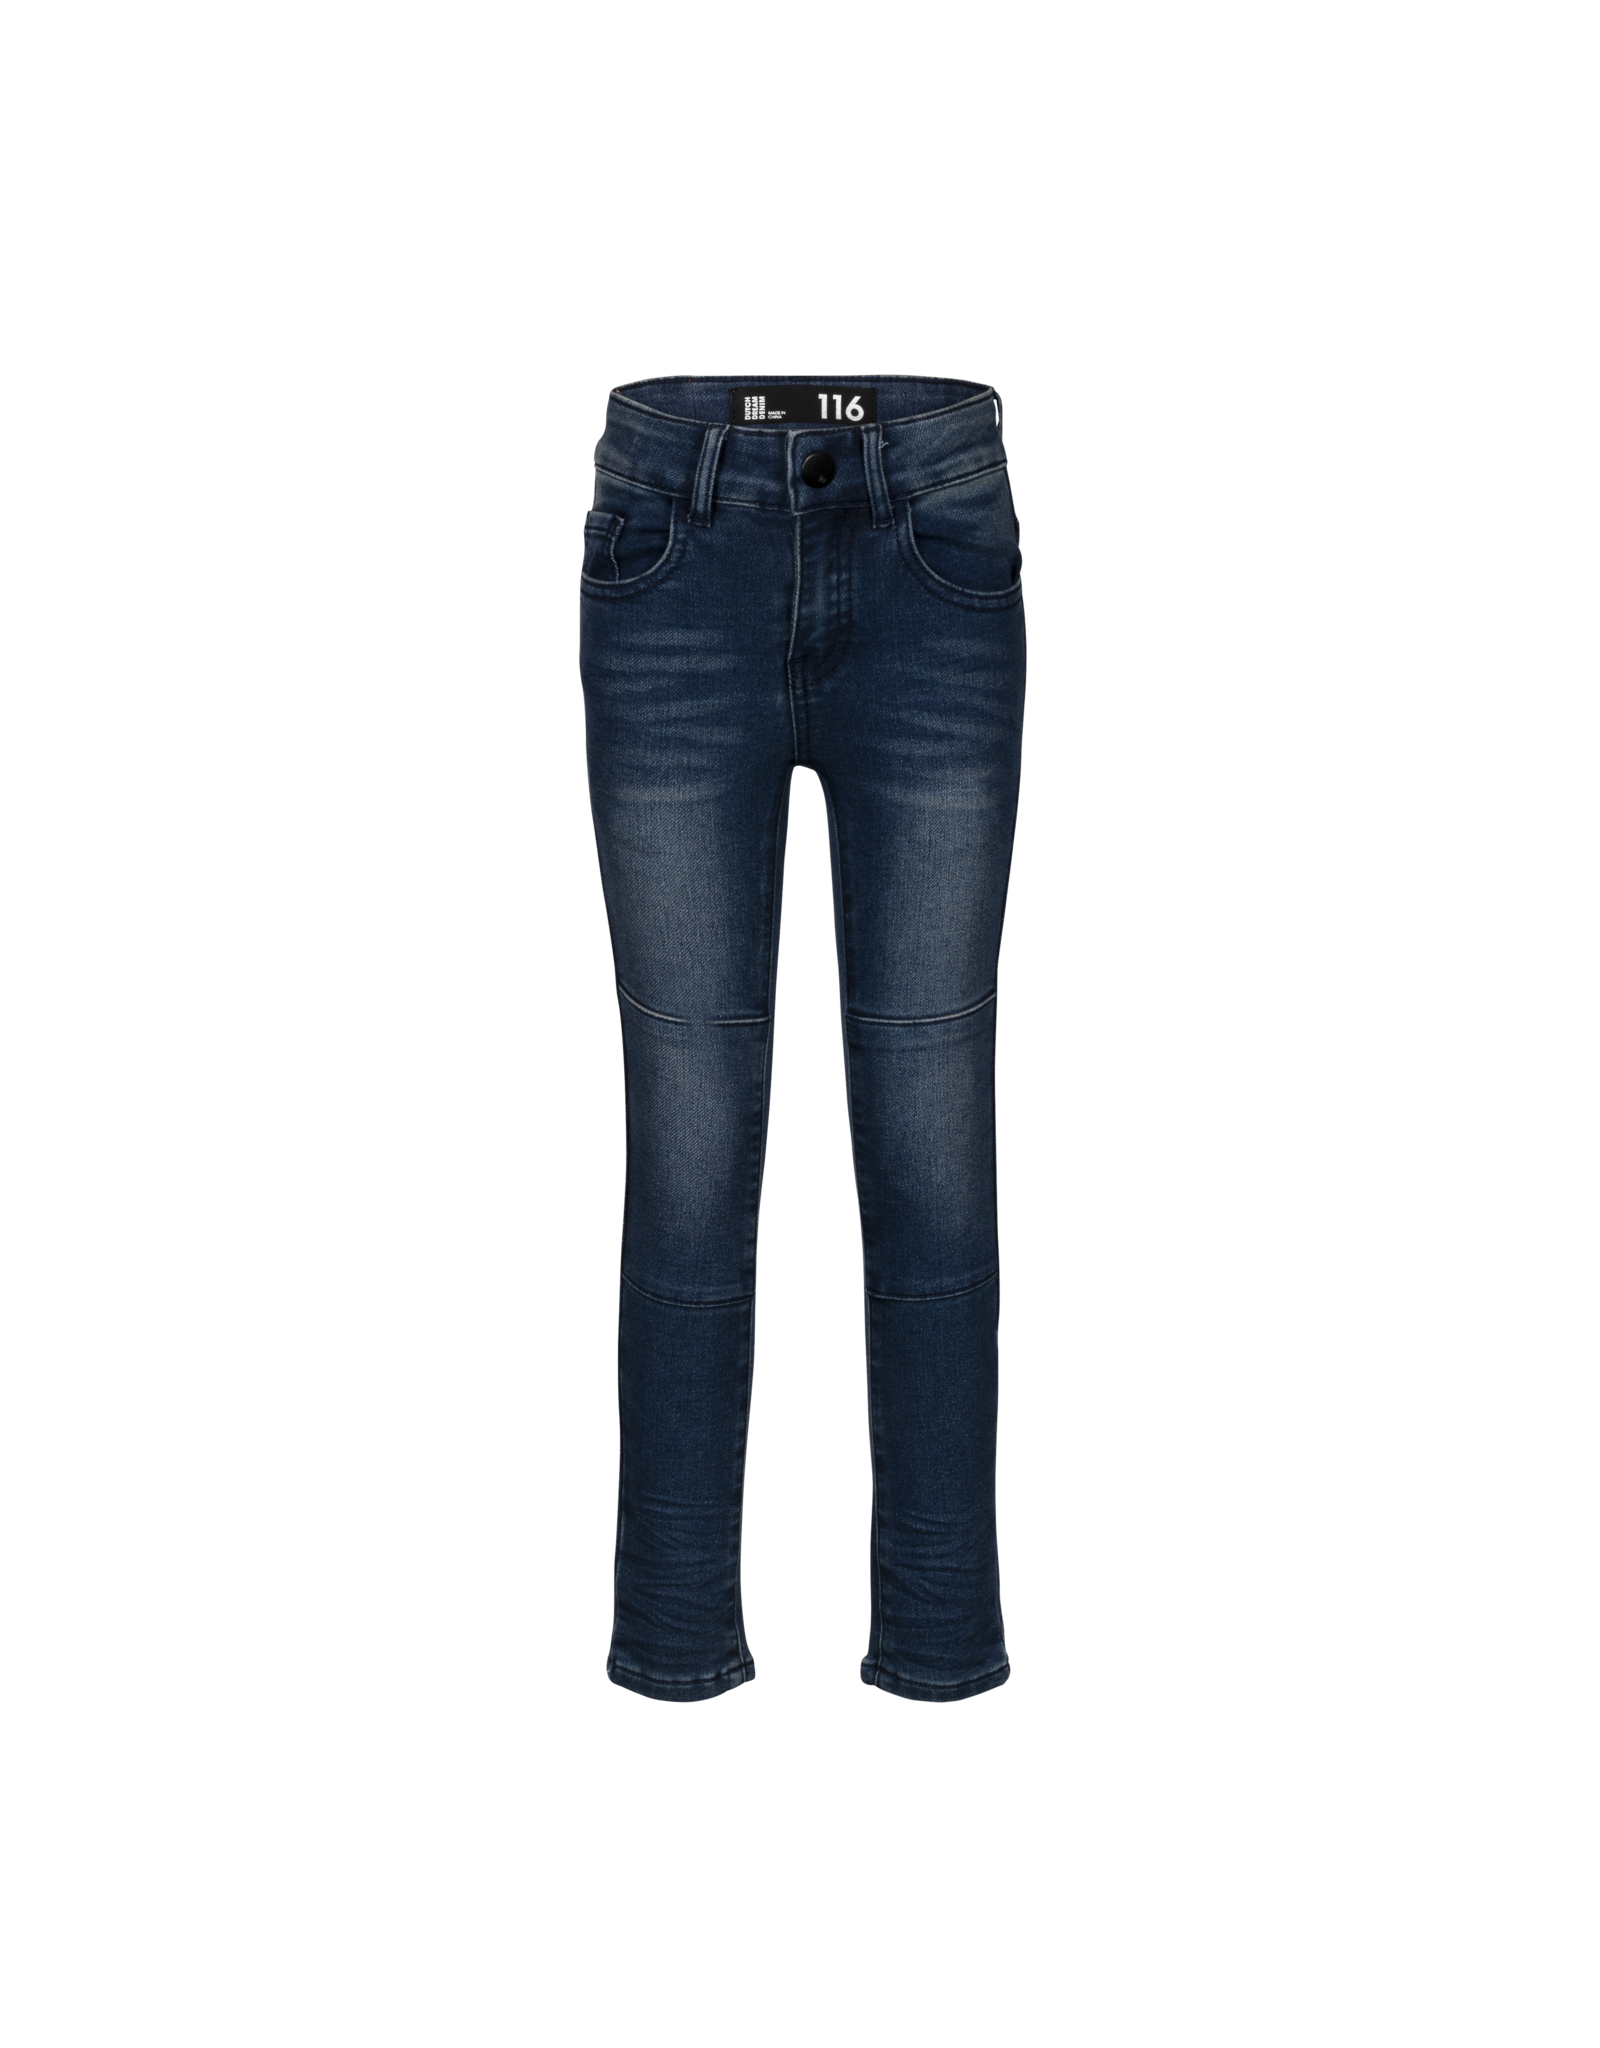 Dutch dream denim MOYO, EXTRA SLIM FIT Jogg jeans met dubbele laag stof op de knieën